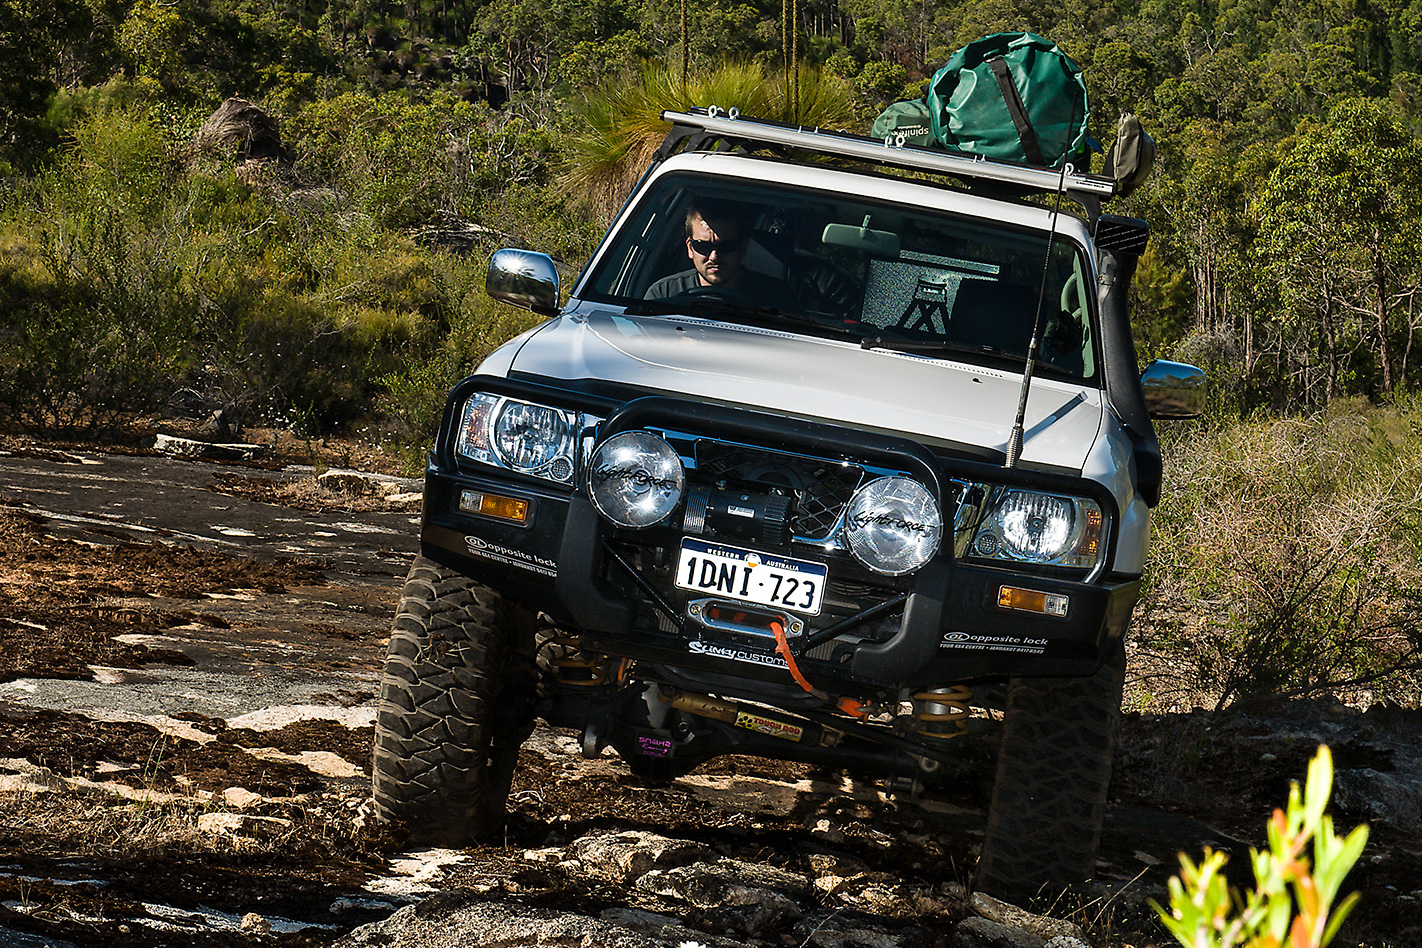 2010 Nissan Patrol GU7 Ti water crossing